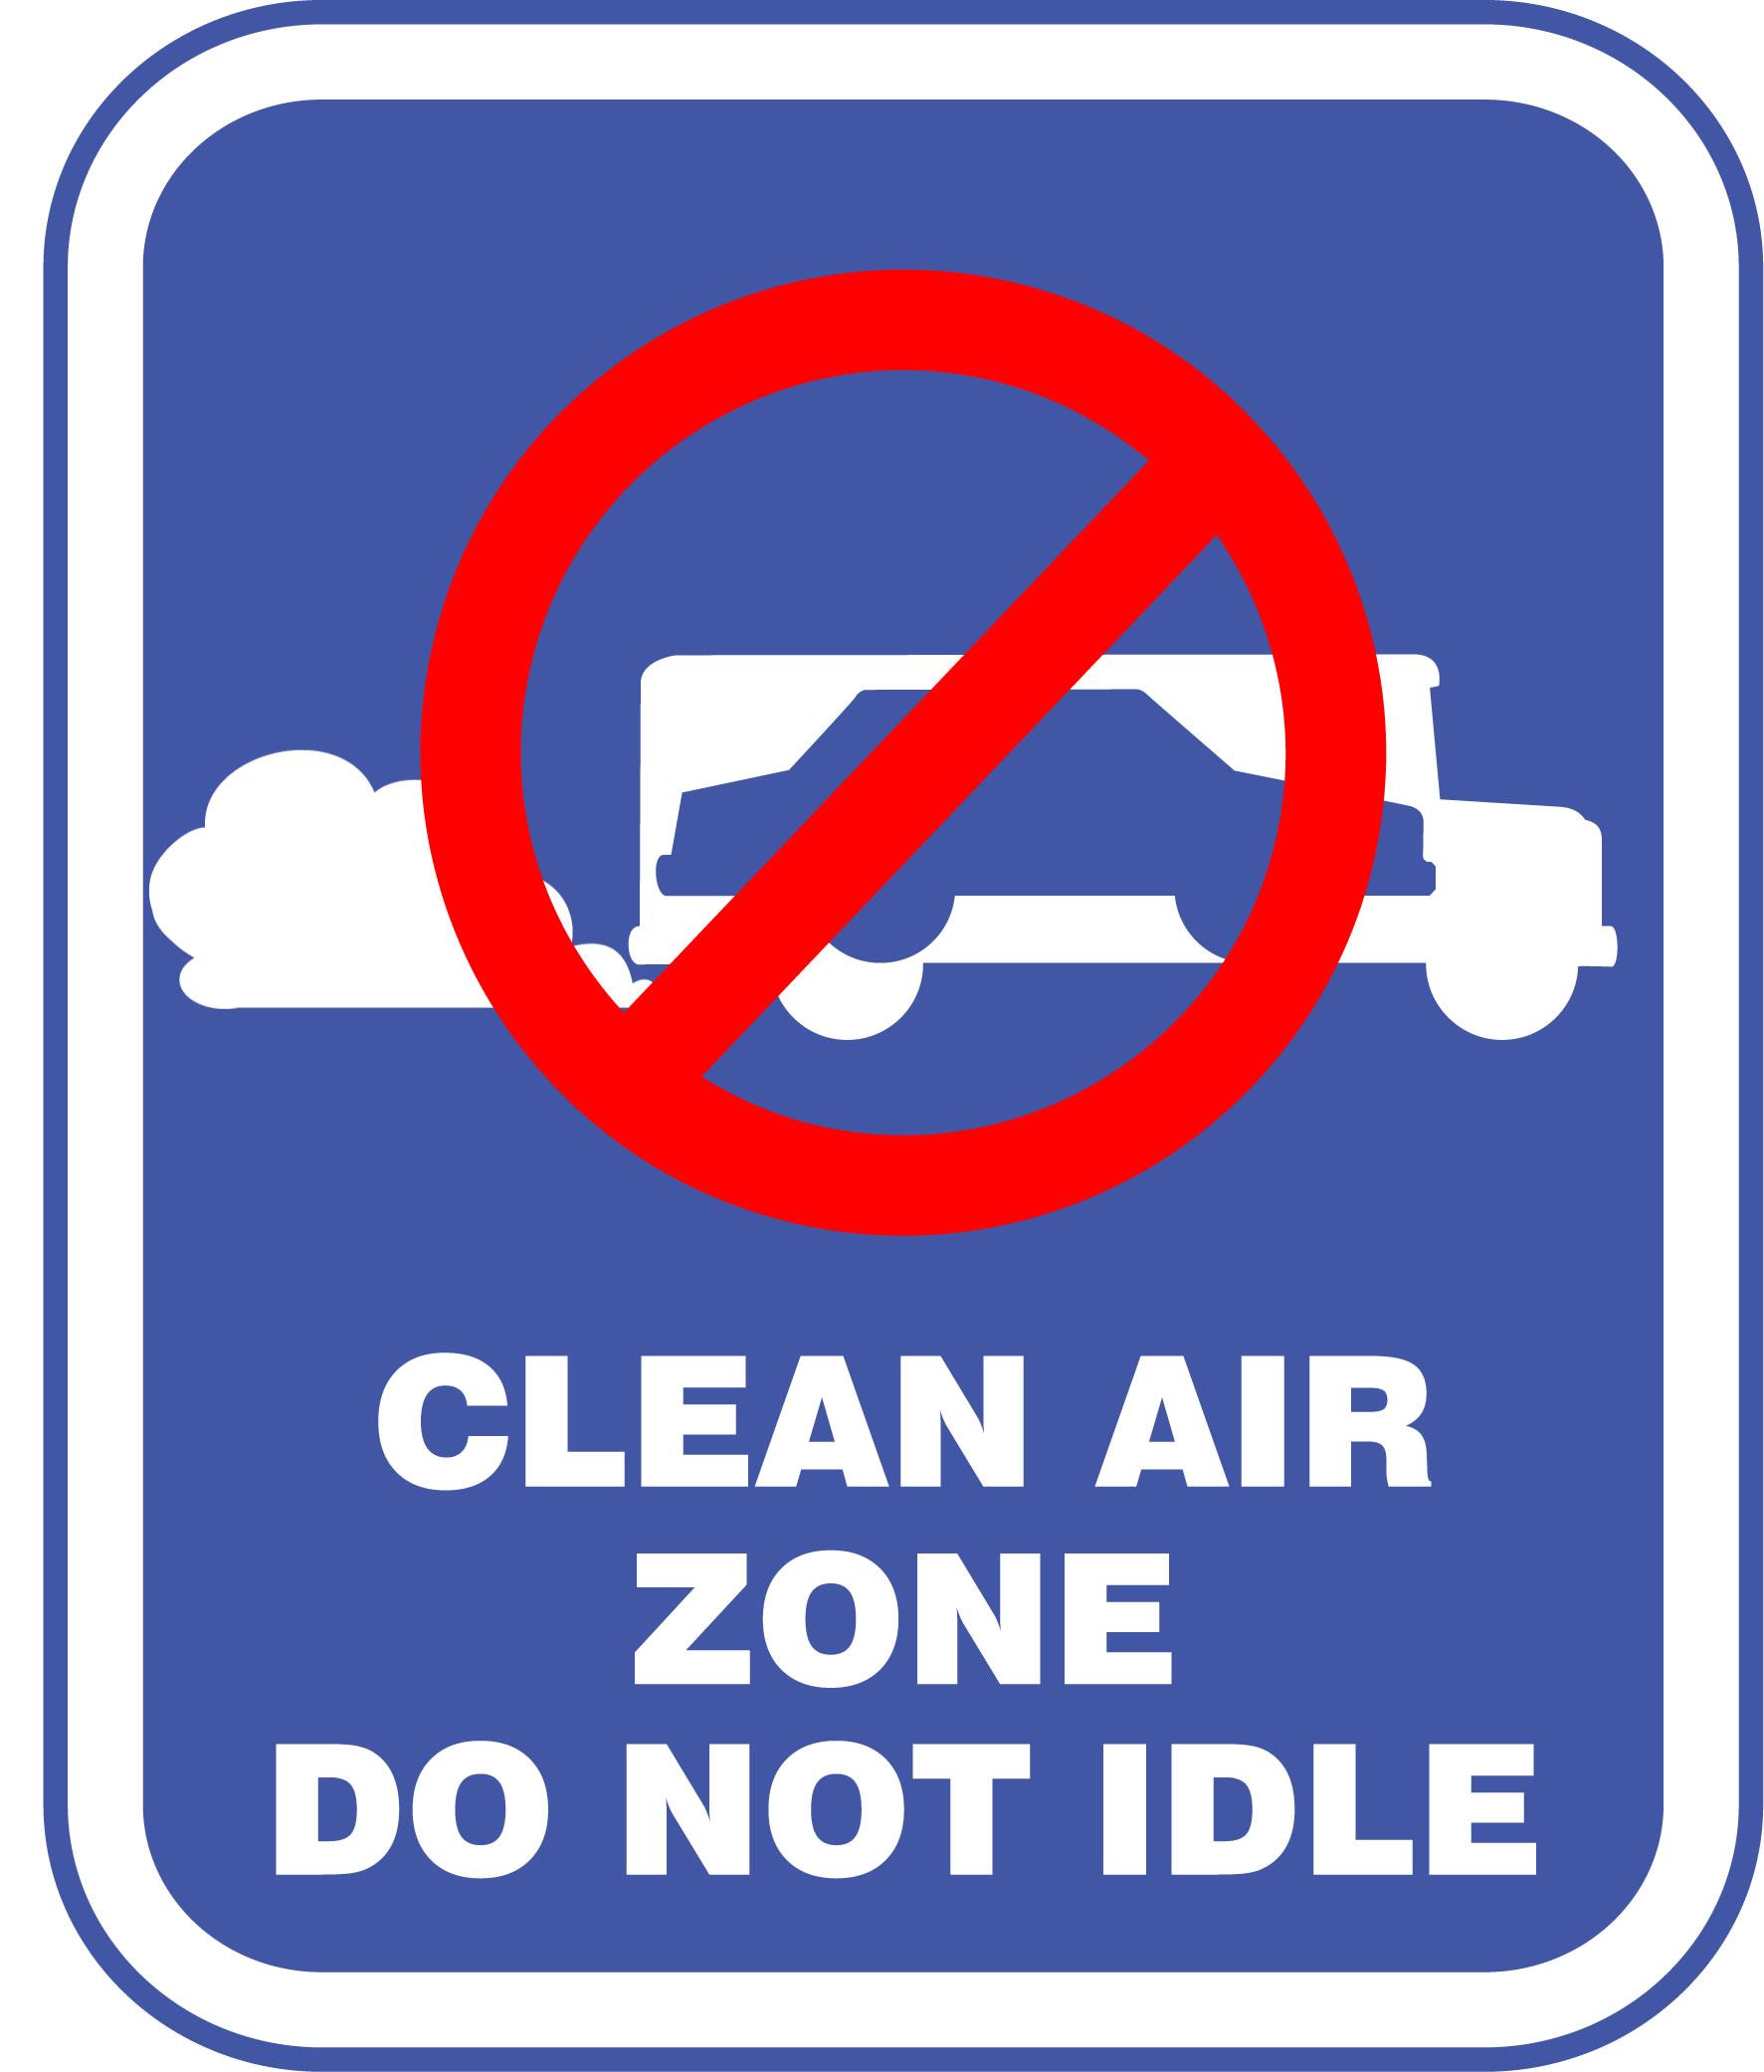 Diesel Powered Motor View Act Act 124 Of 2008 Clean